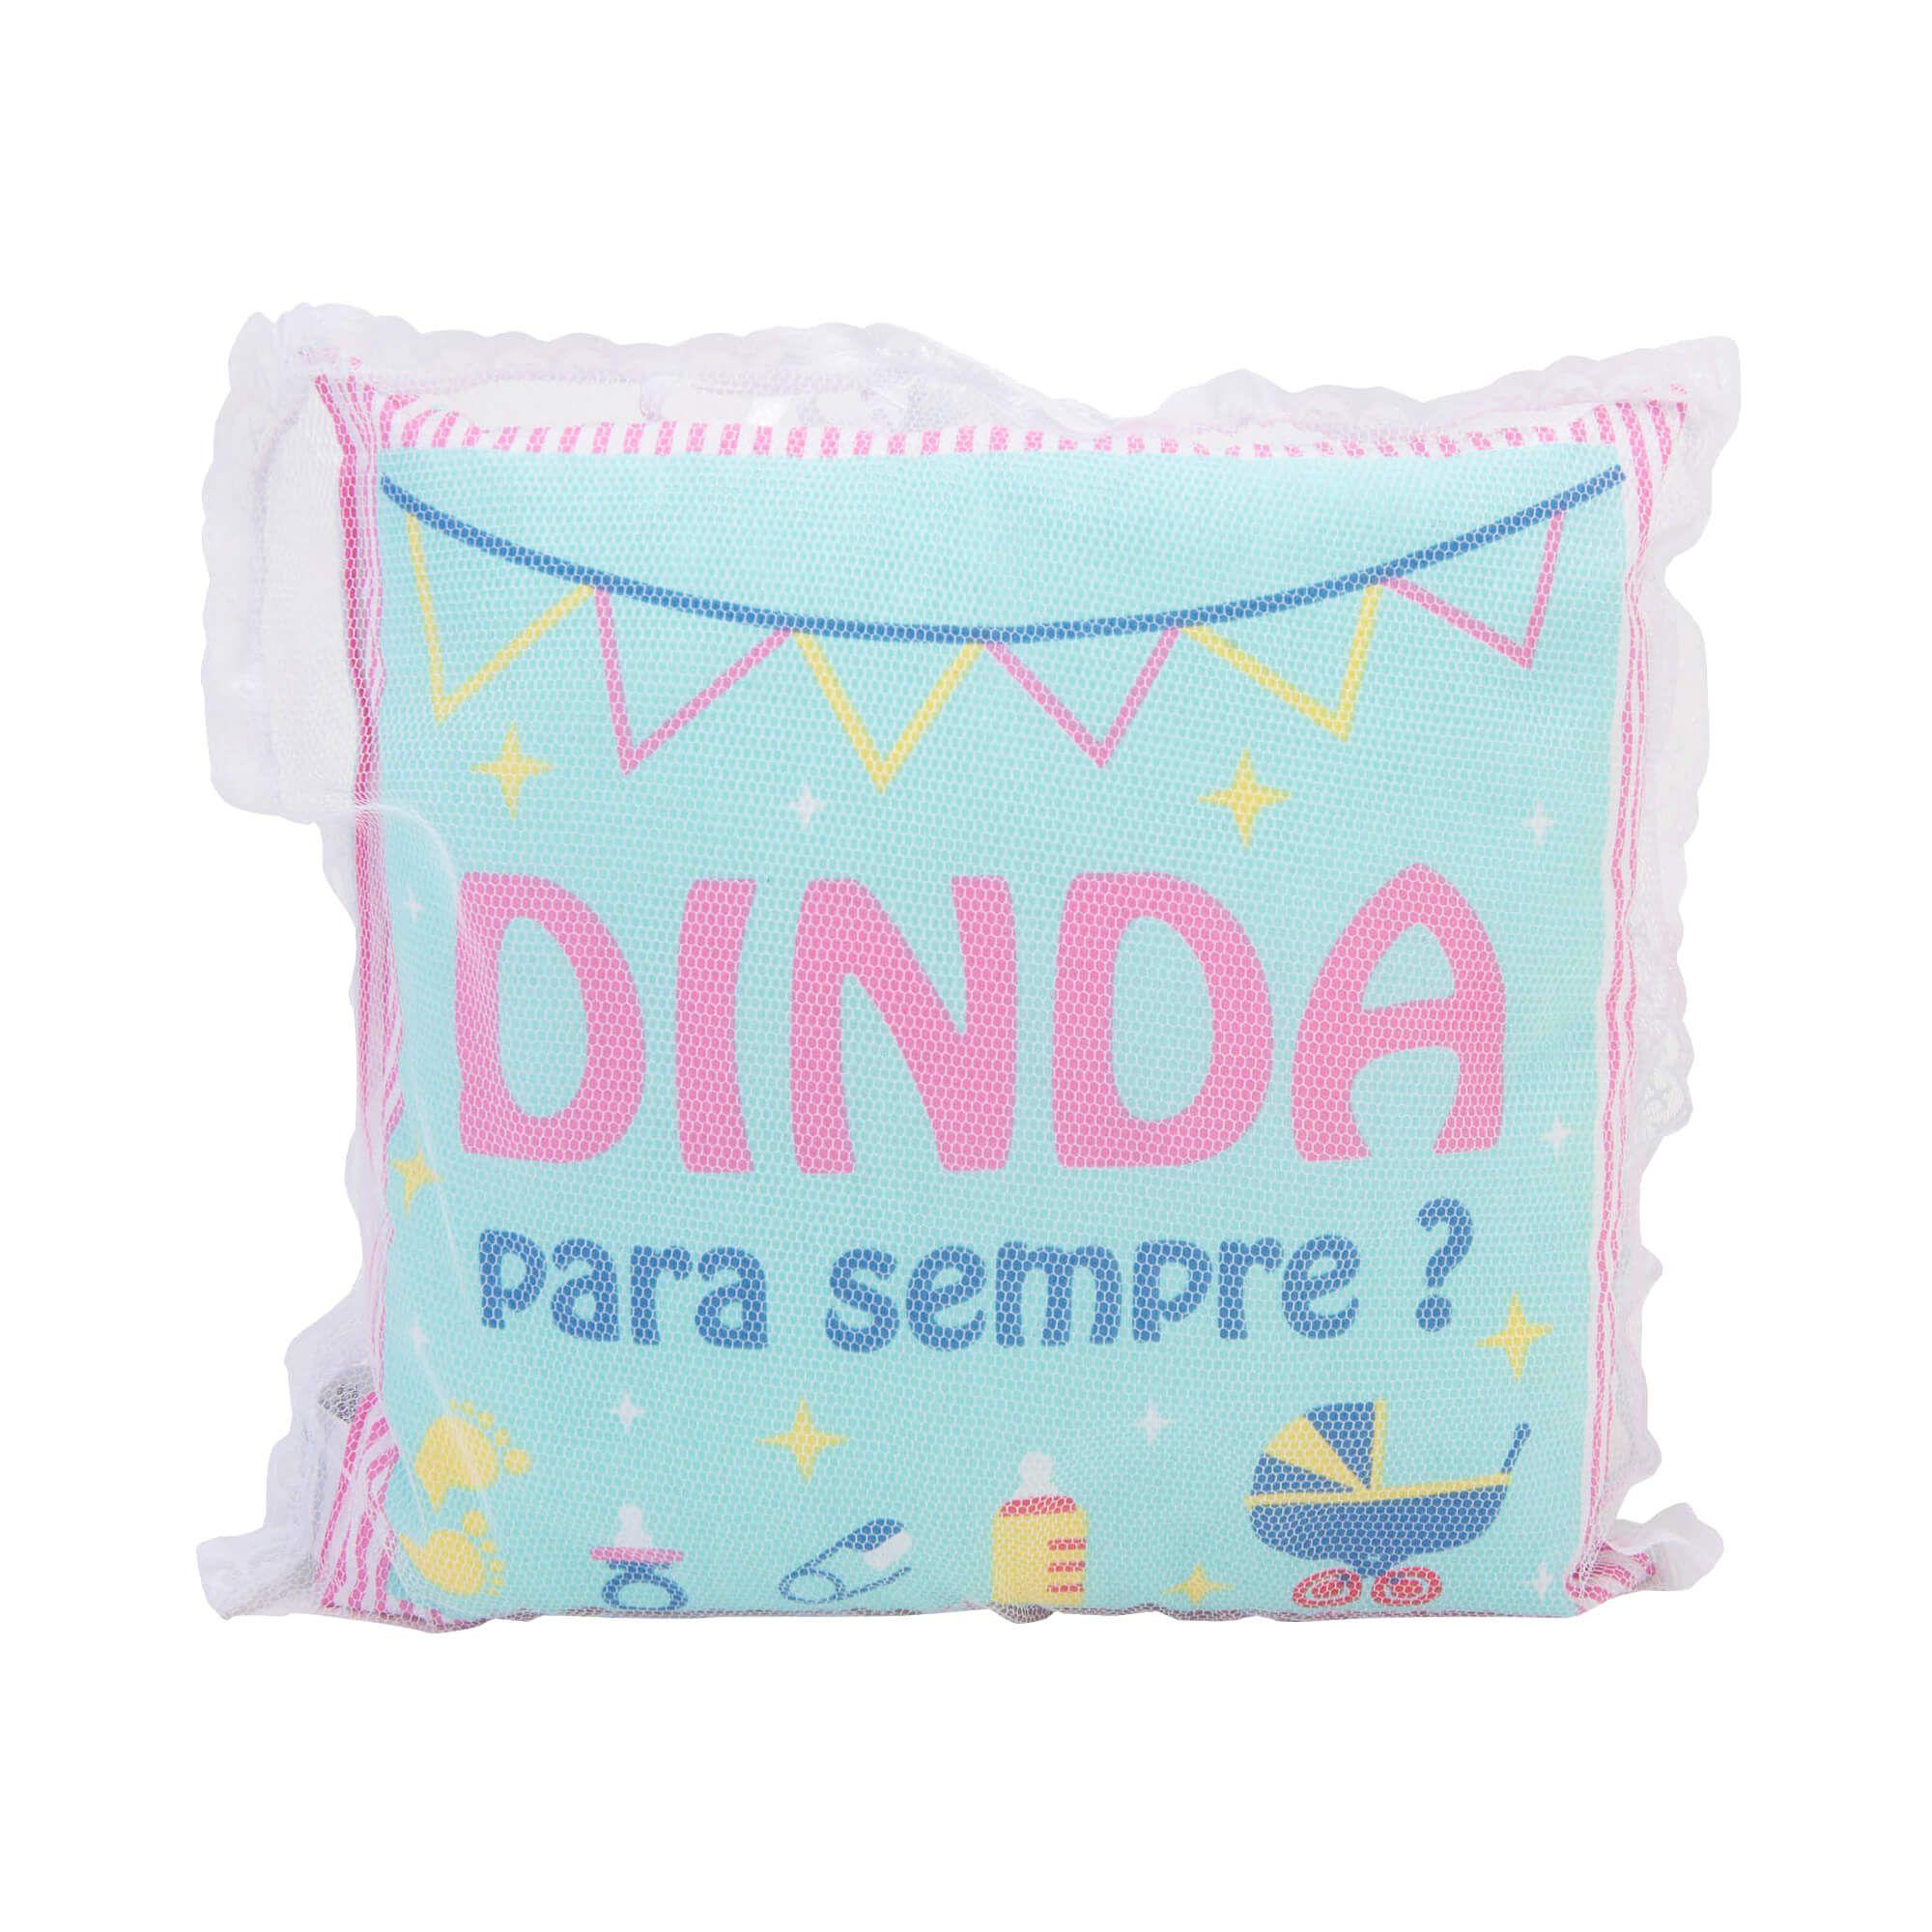 Almofada Incomfral Babyjoy - Dinda